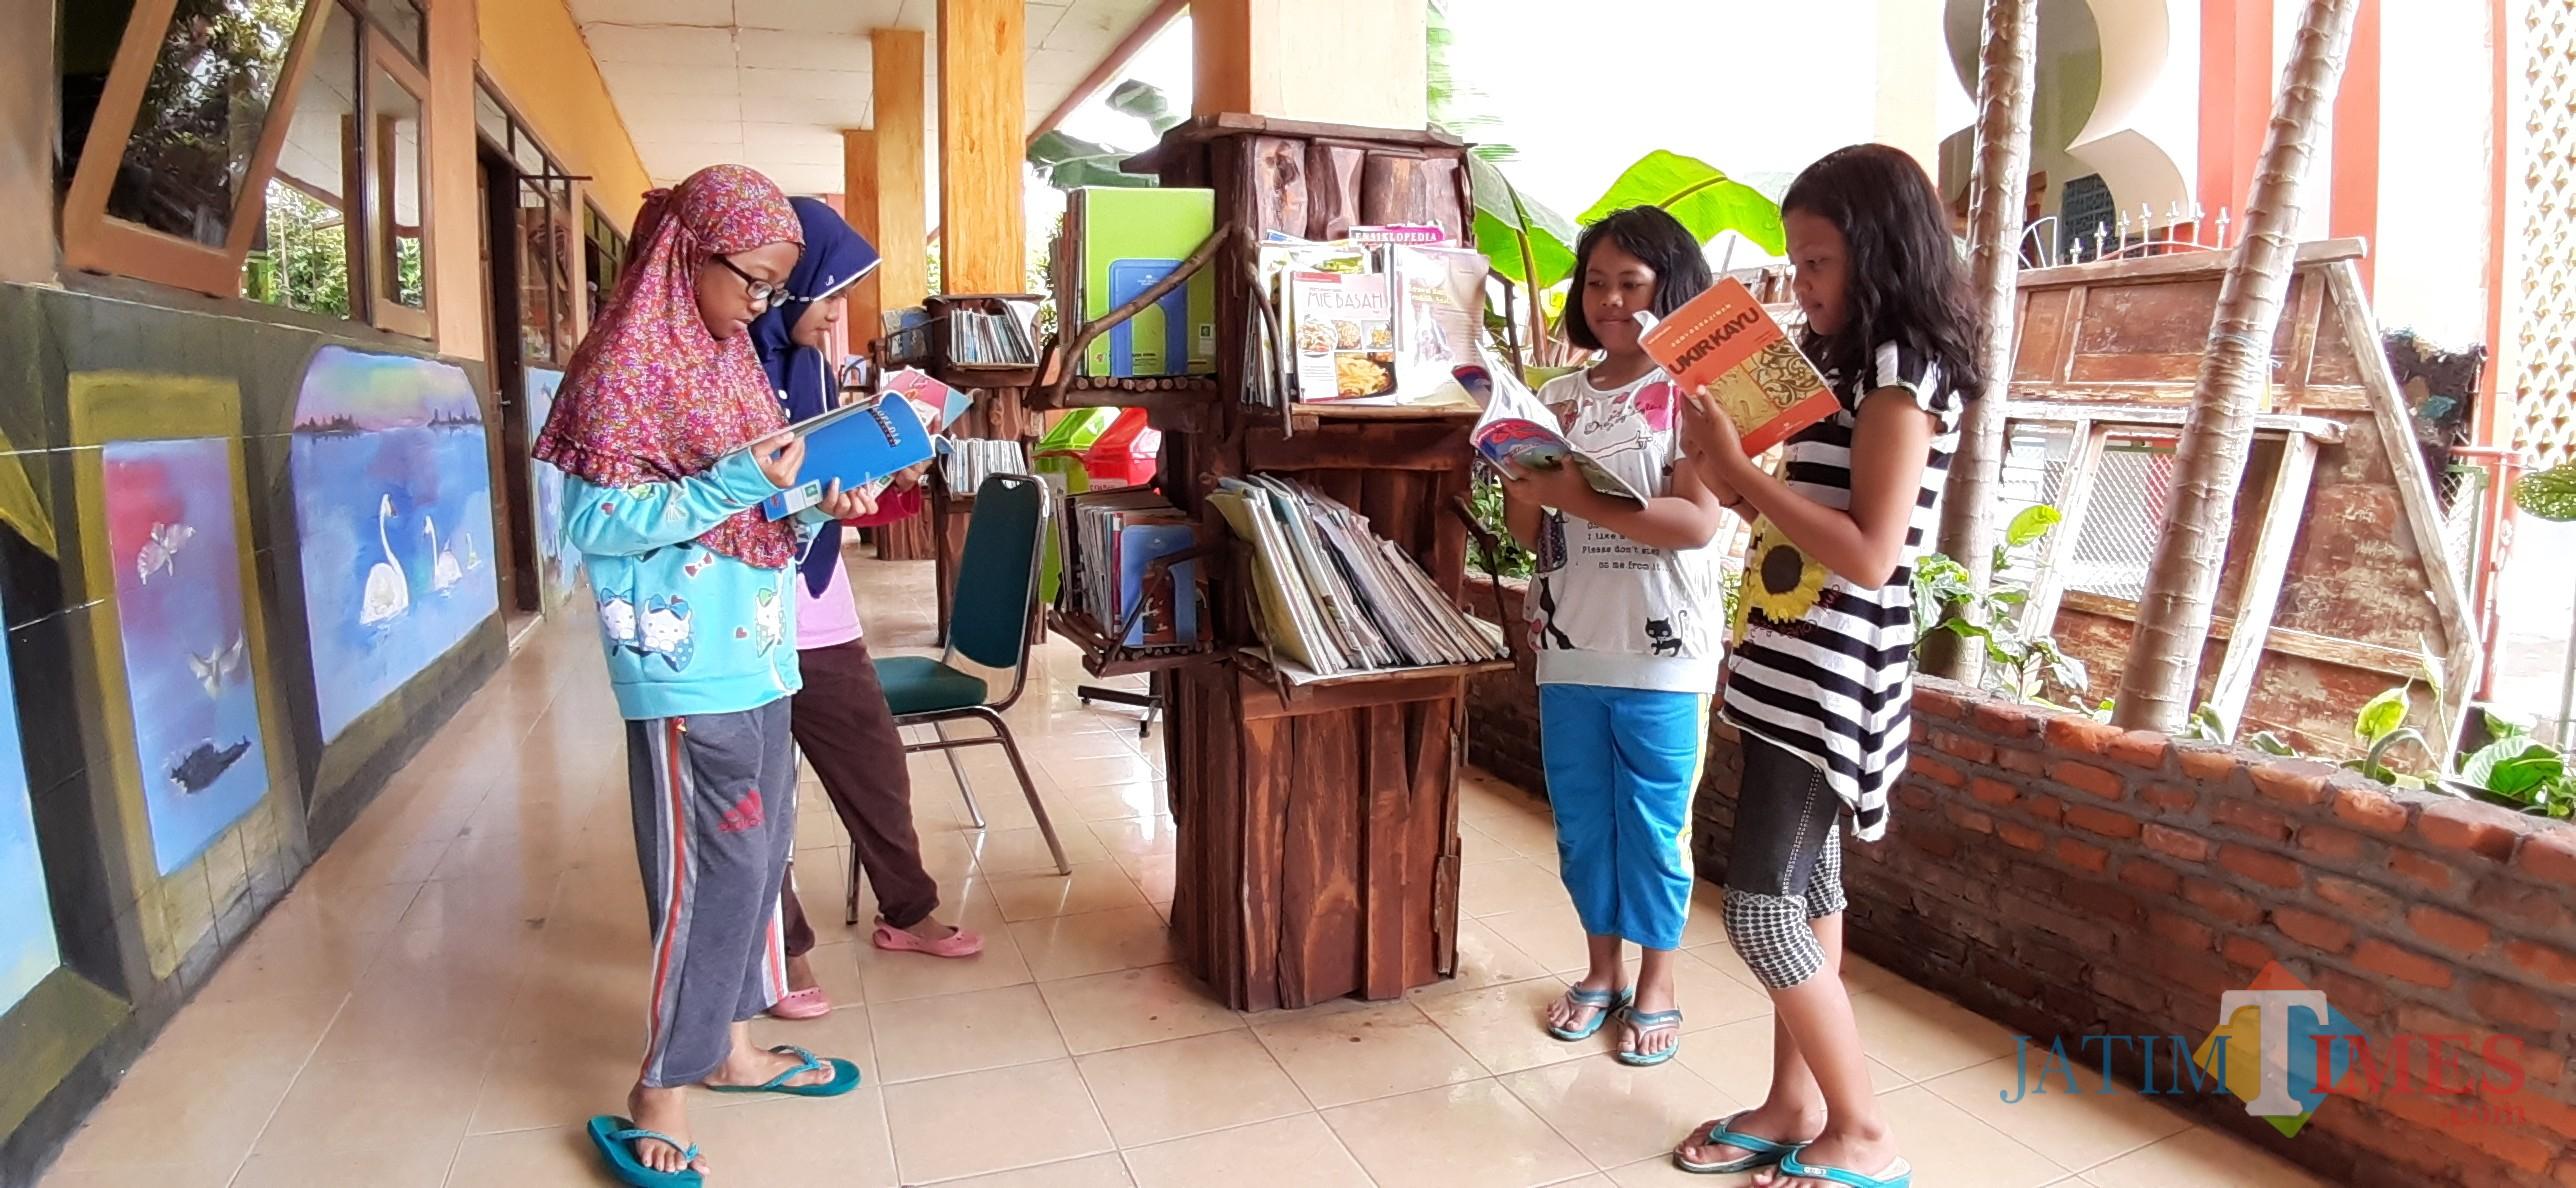 Suasana saat anak - anak tengah memilah buku untuk dibaca di hari libur (Arifina Cahyanti Firdausi/MalangTIMES)